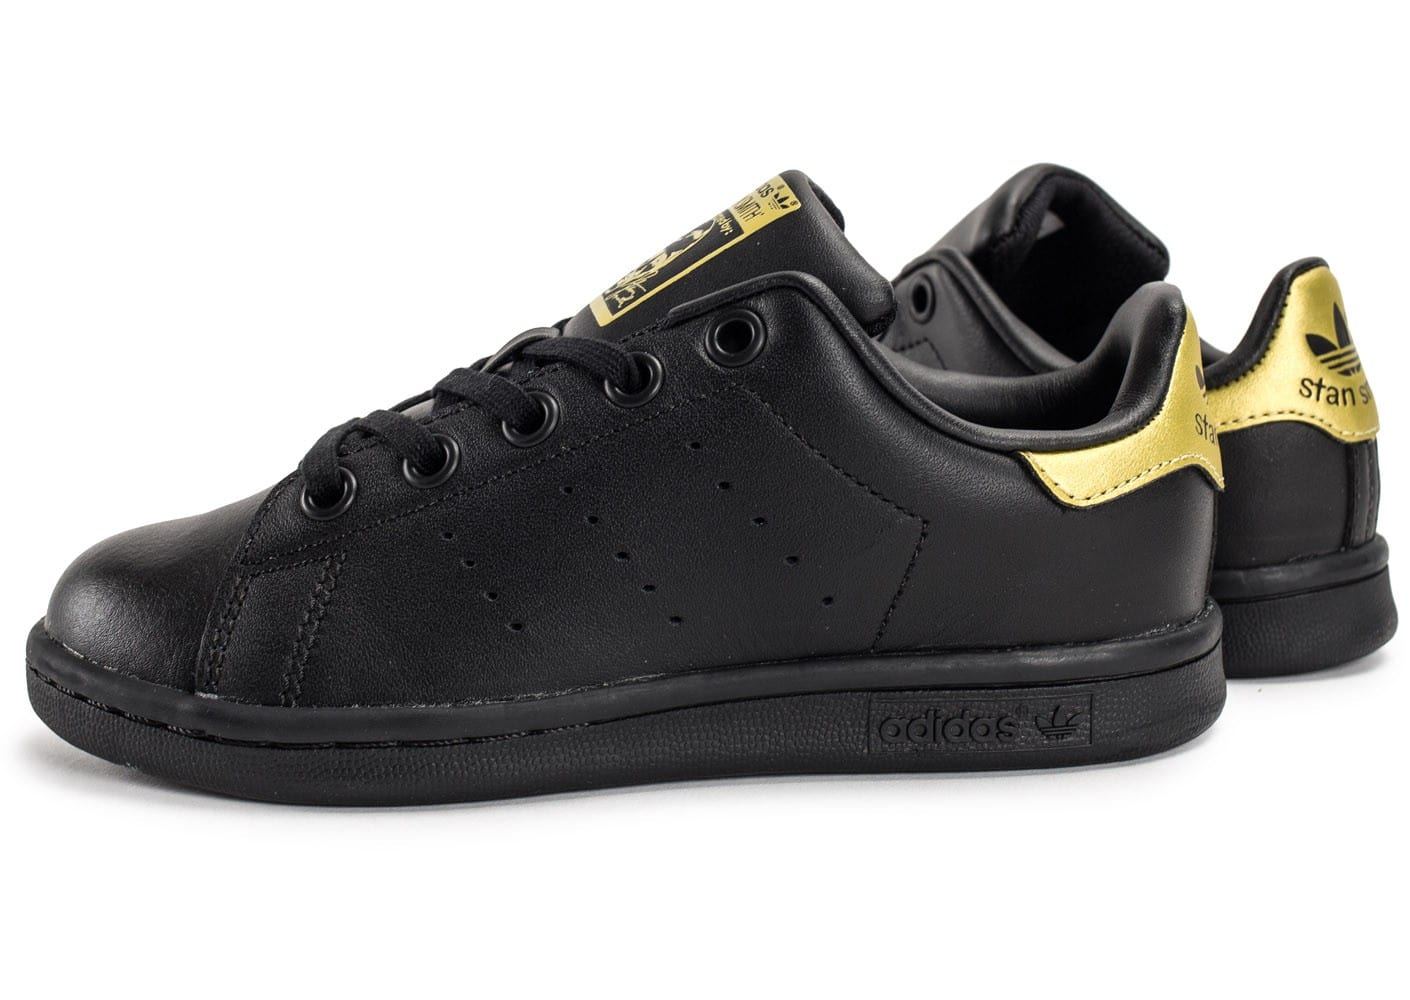 adidas stan smith noir et or